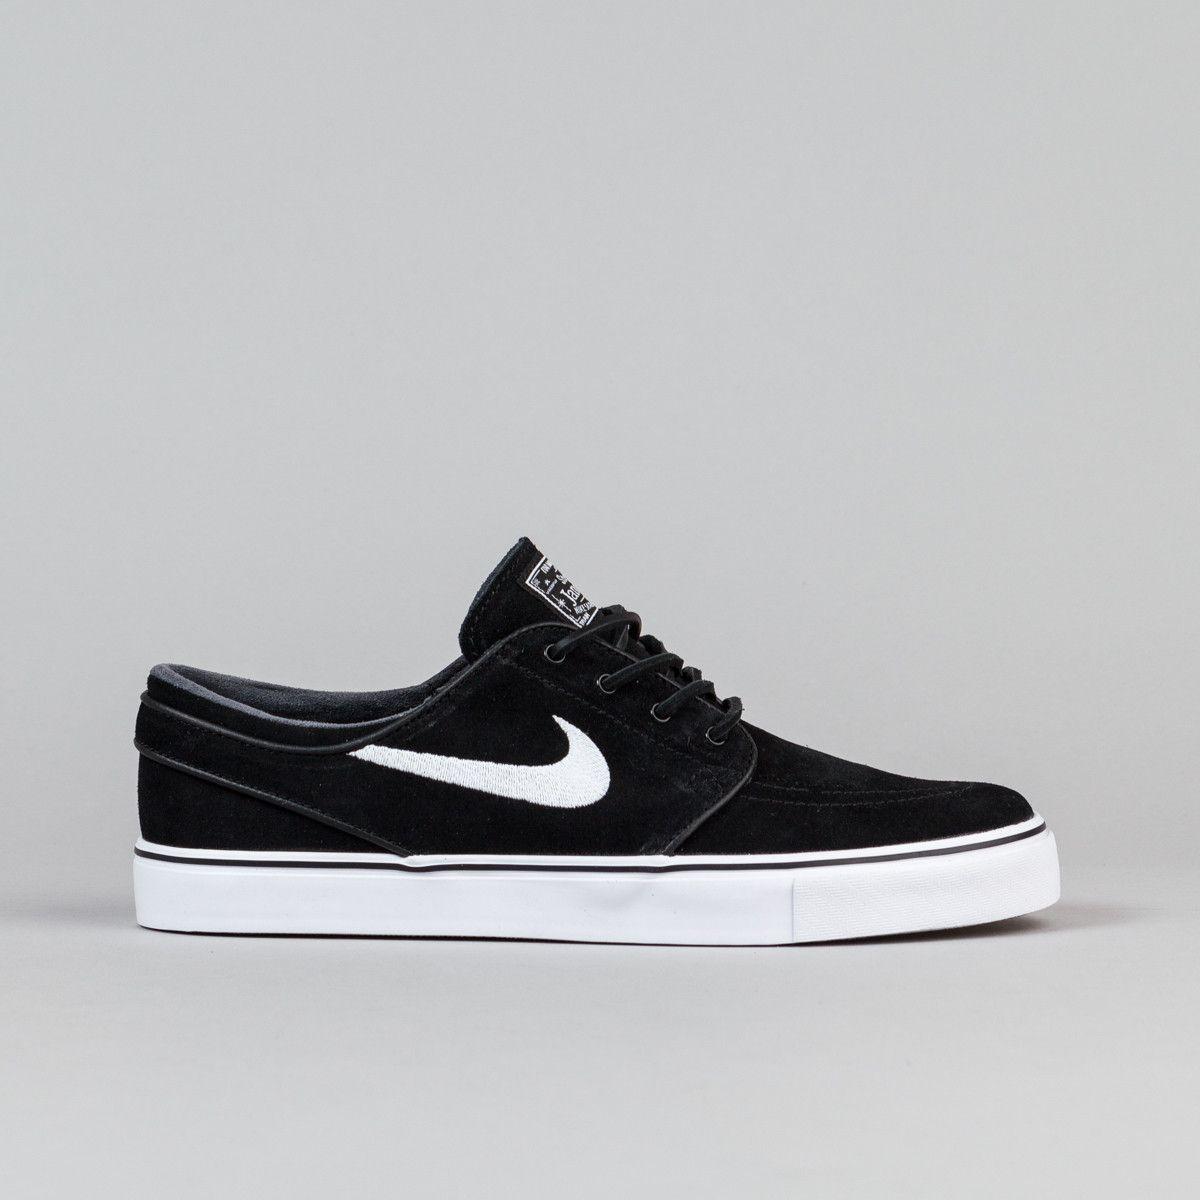 4923f3cca6a43 Nike SB Stefan Janoski OG-Black Wht-Gm Lt Brn